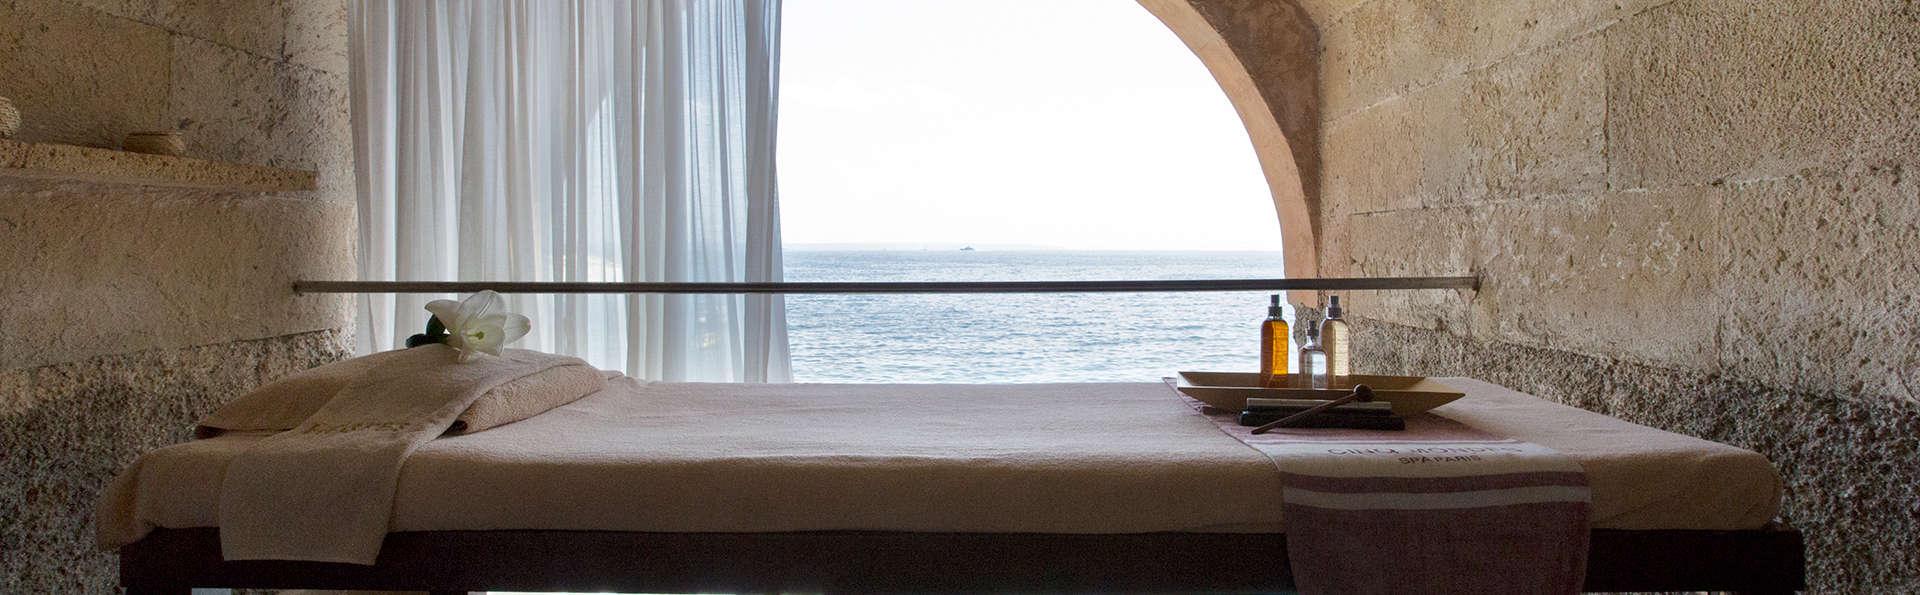 Week-end relax avec spa et massage balinais à Majorque